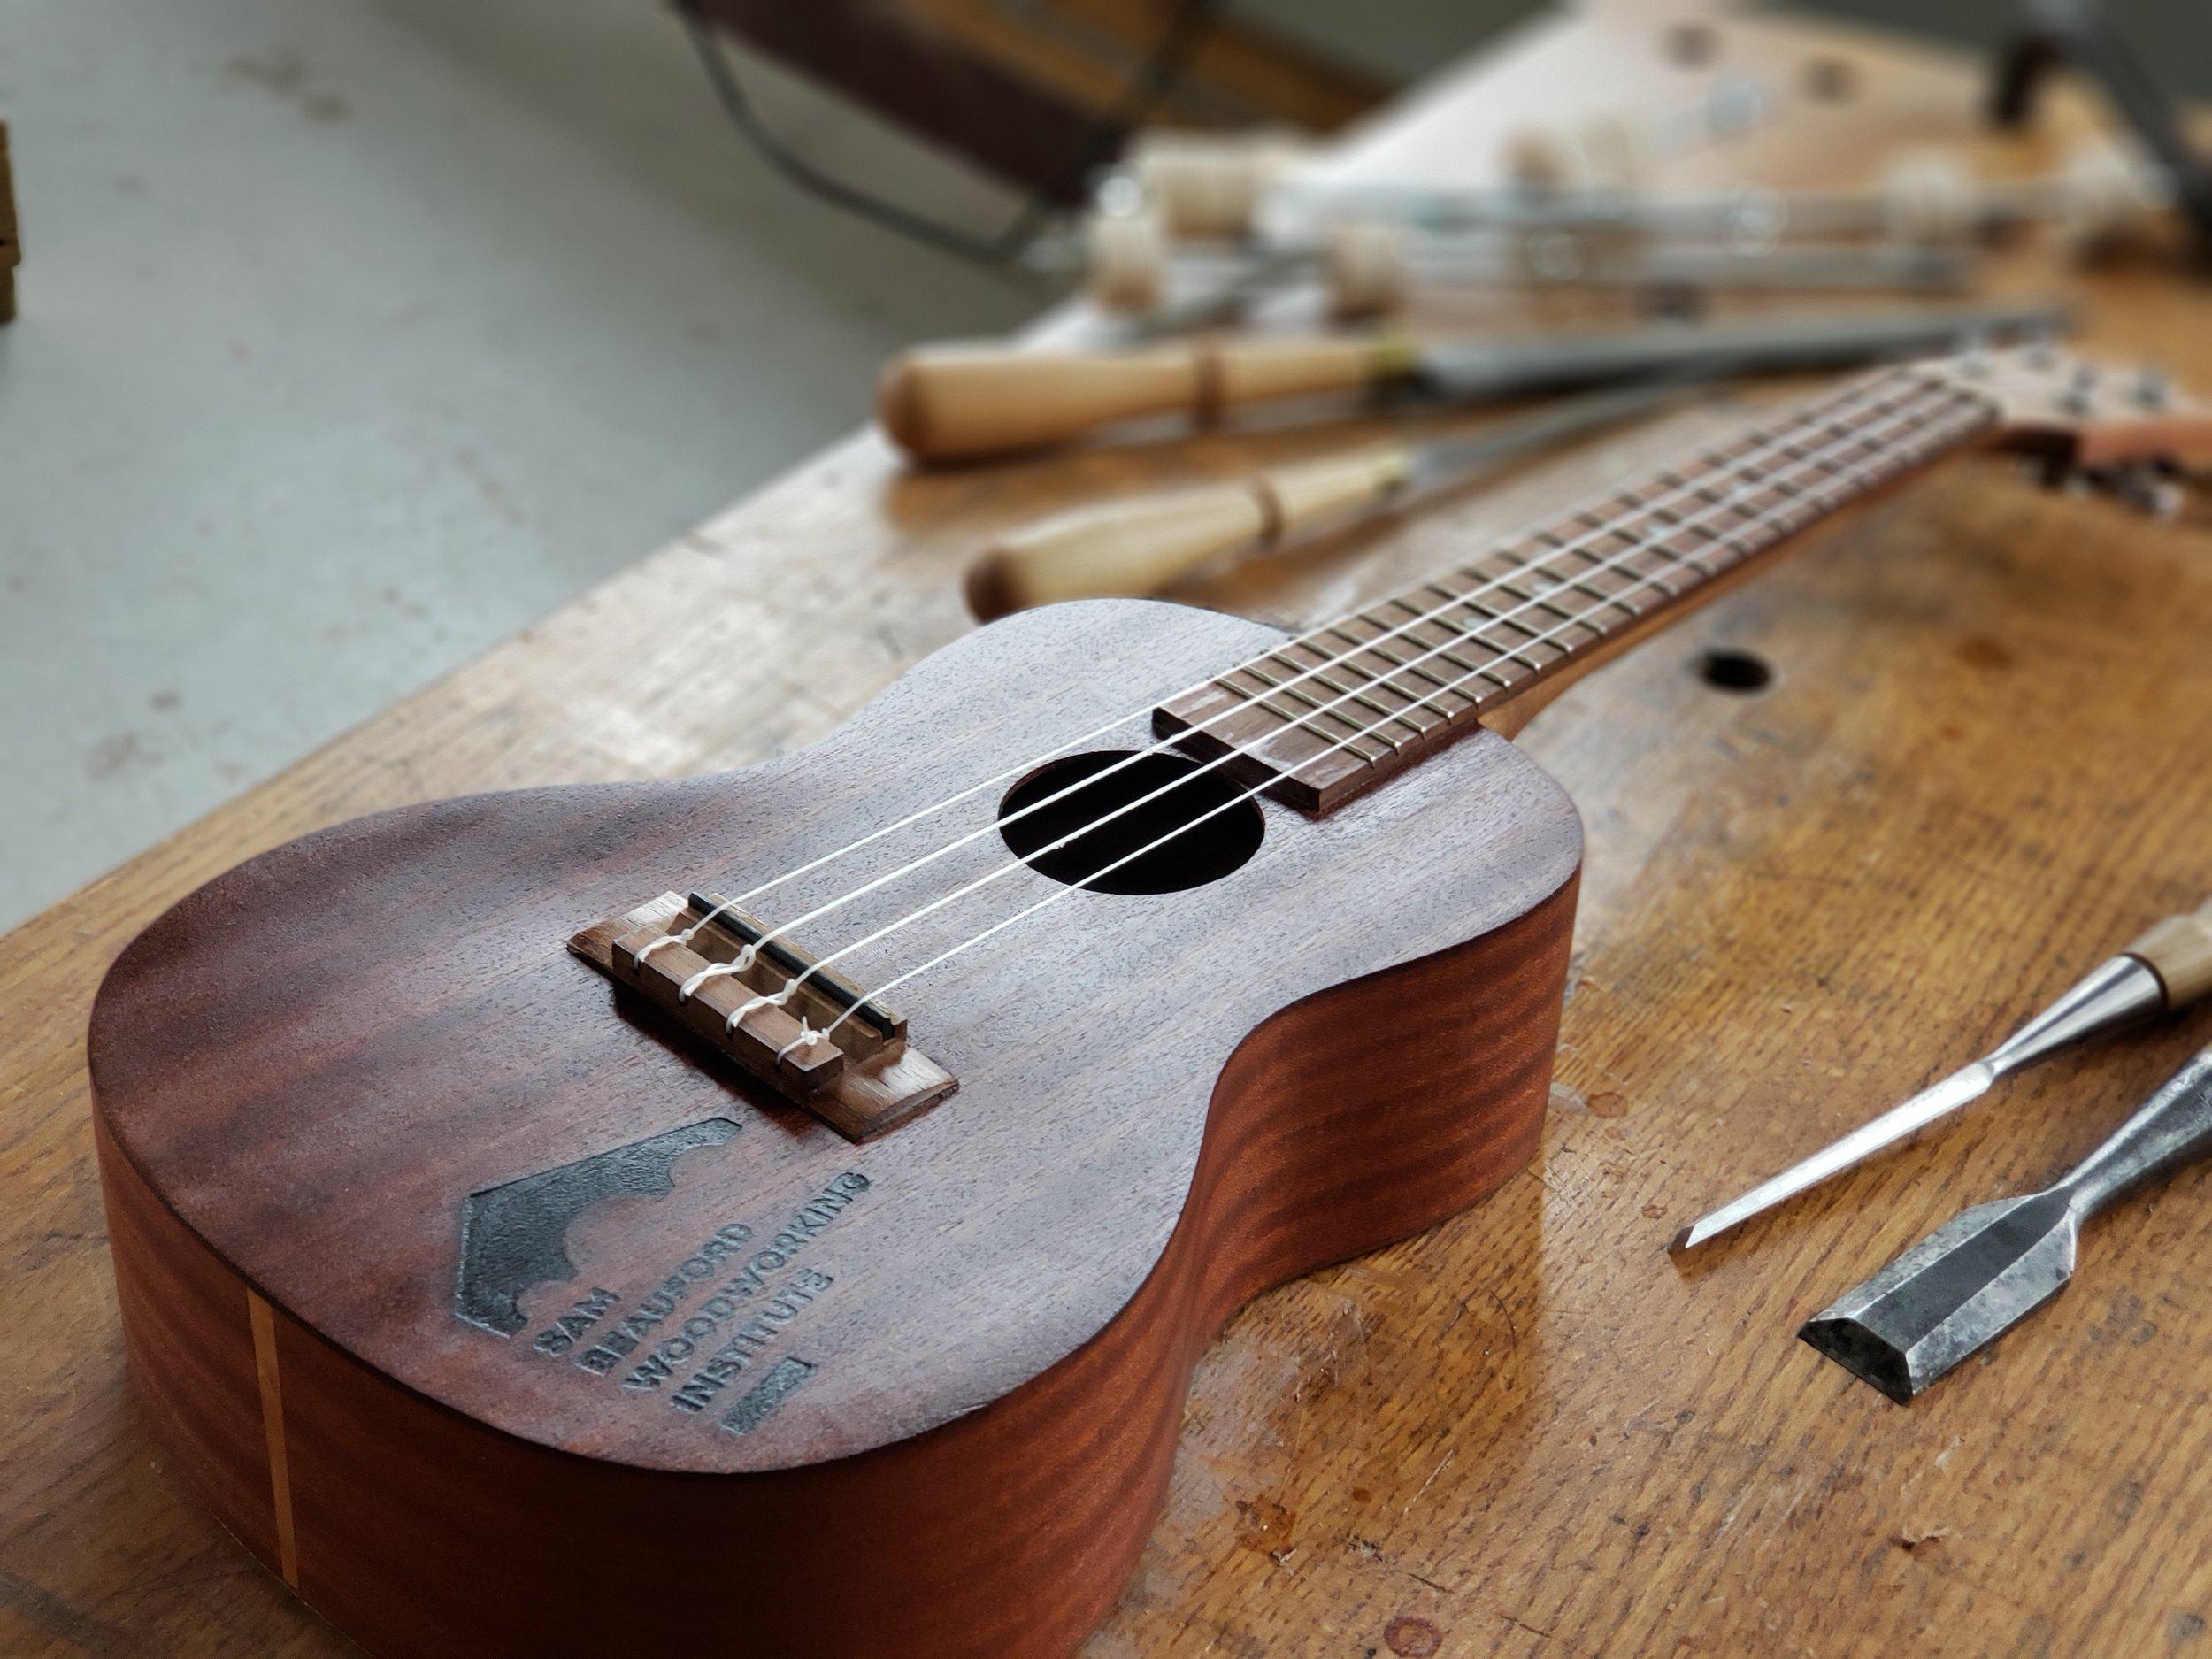 Build a Concert Ukulele Woodworking Class - Instrument Classes